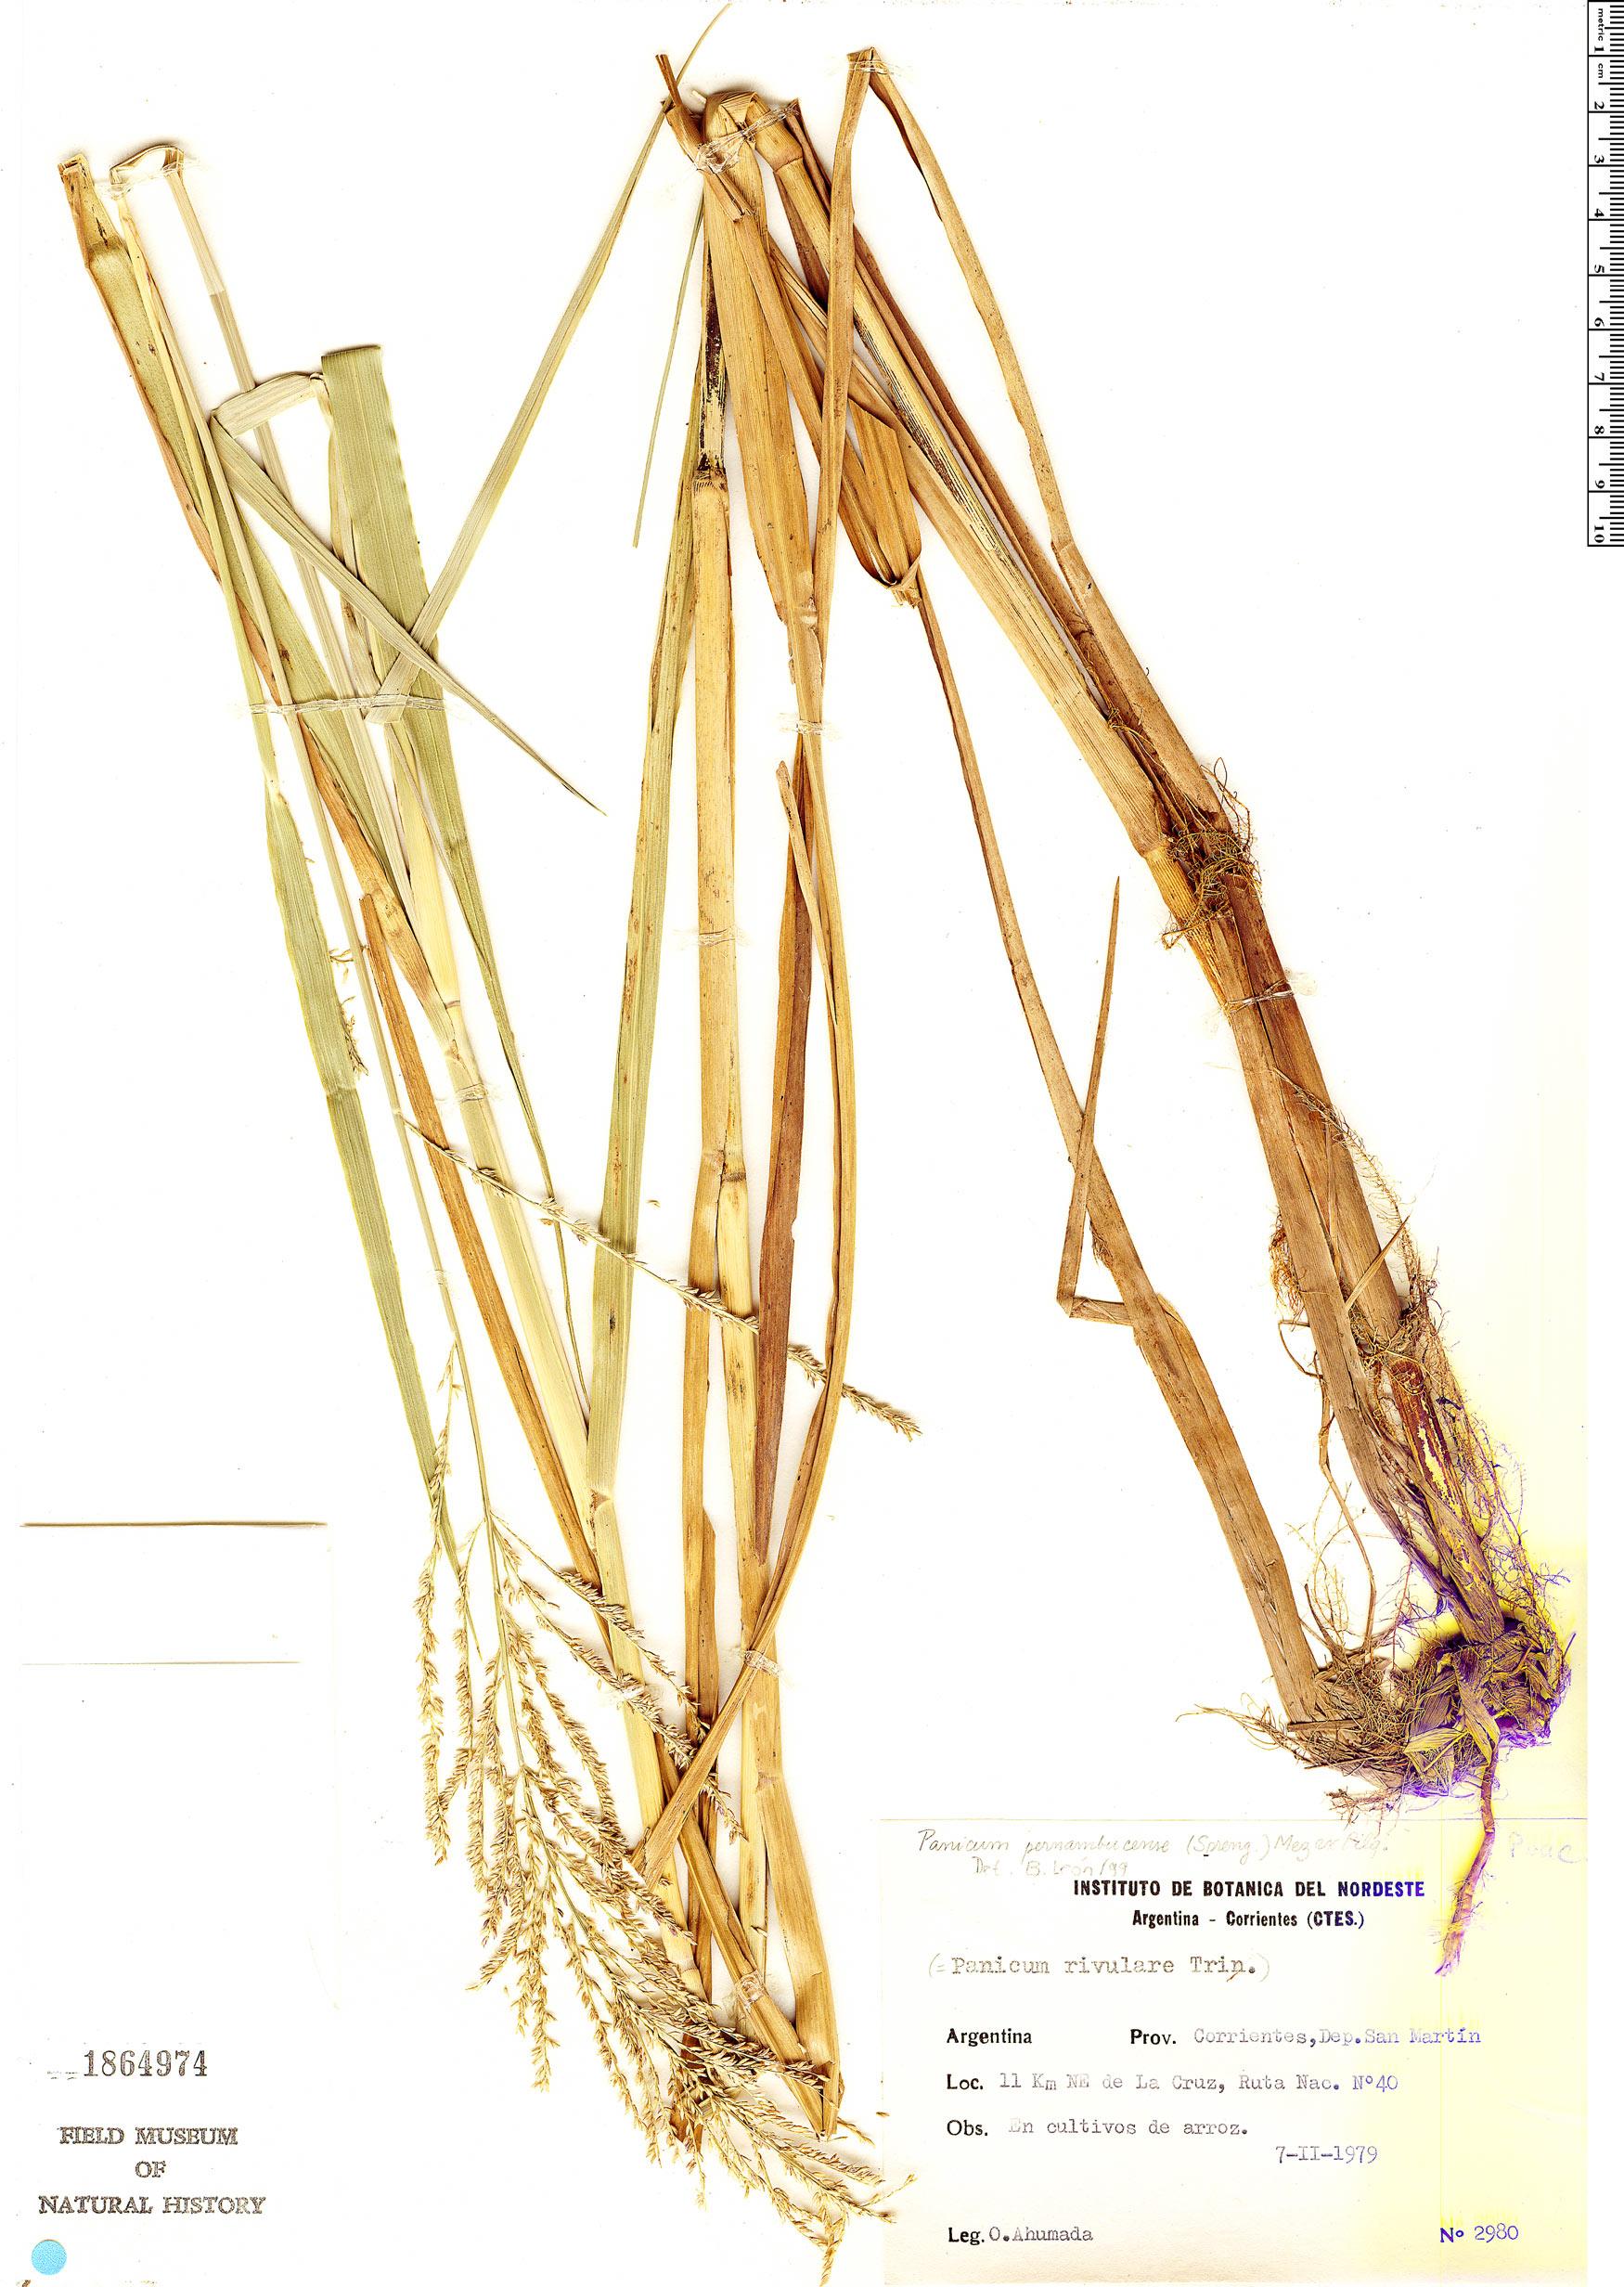 Espécime: Hymenachne pernambucensis